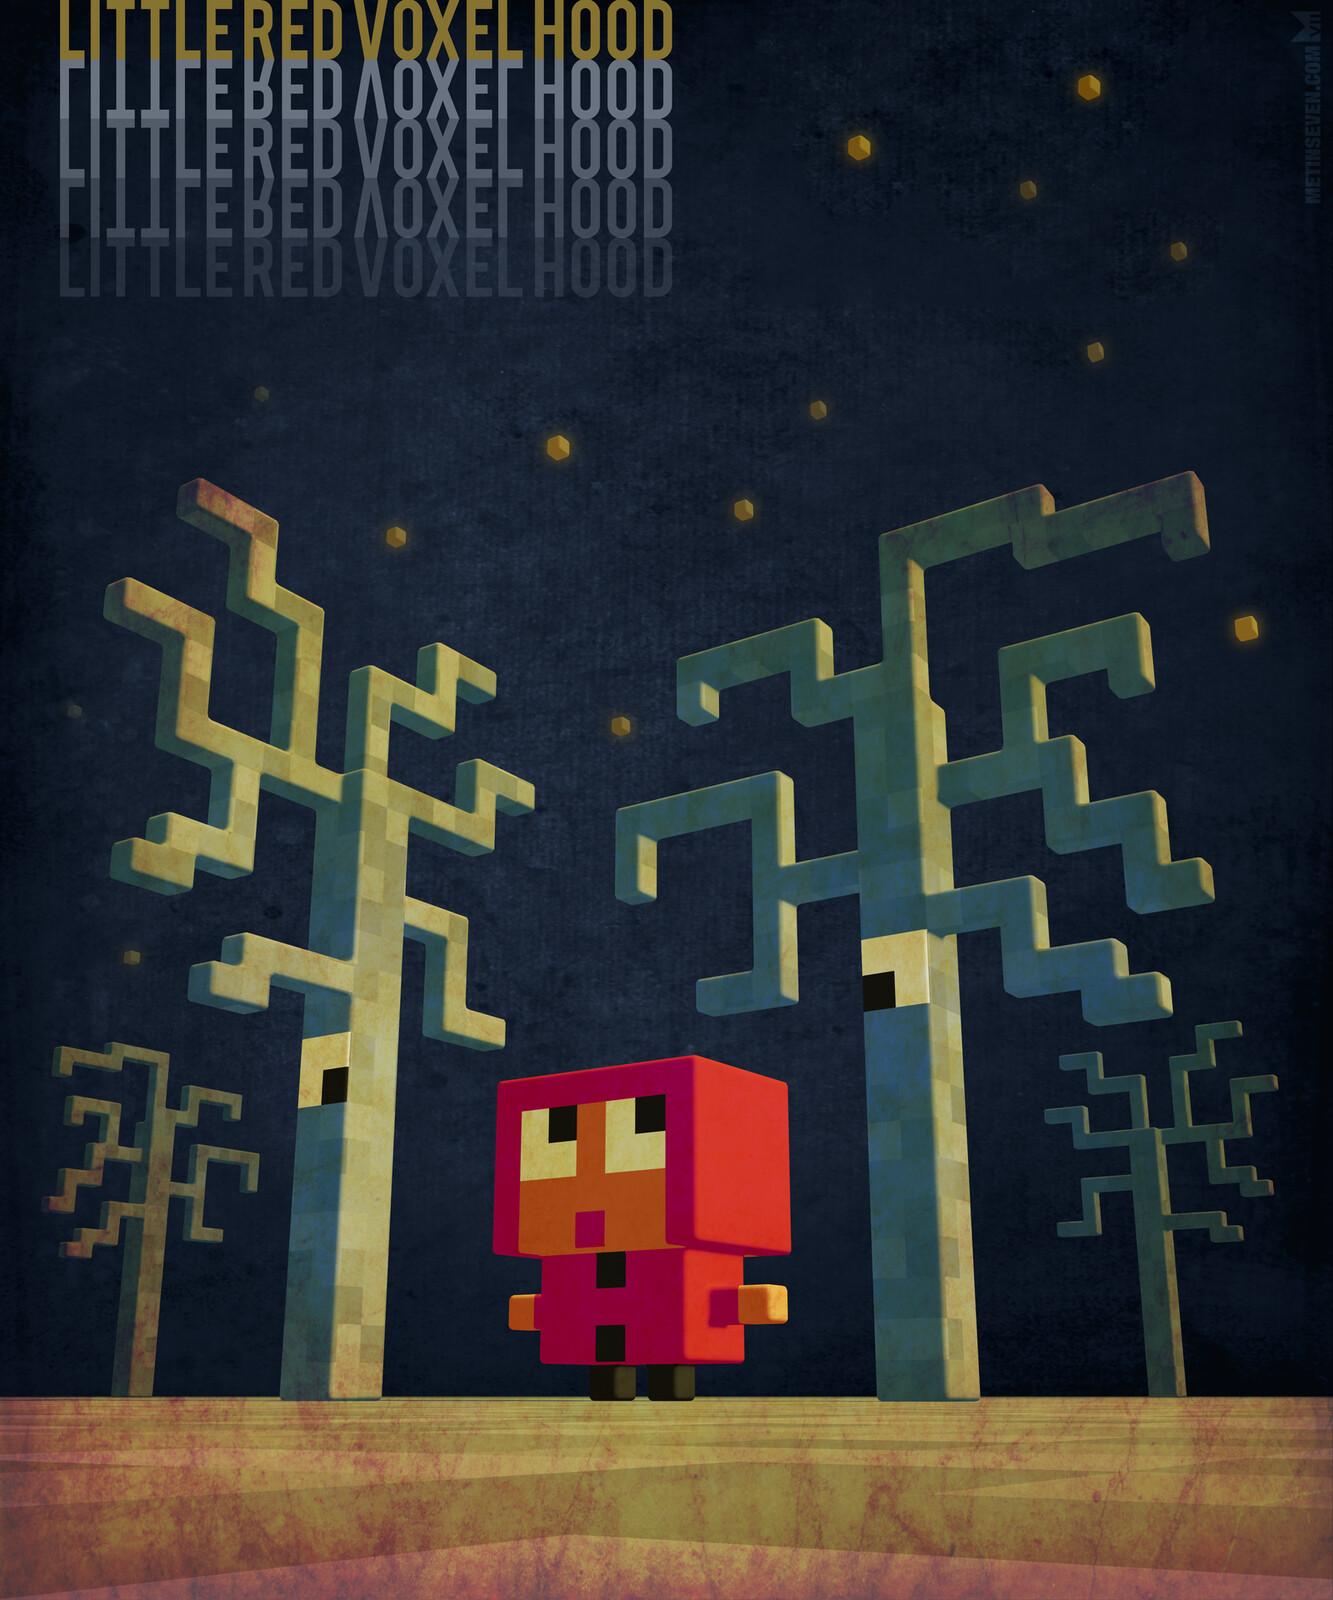 Little Red Voxel Hood, children's book concept